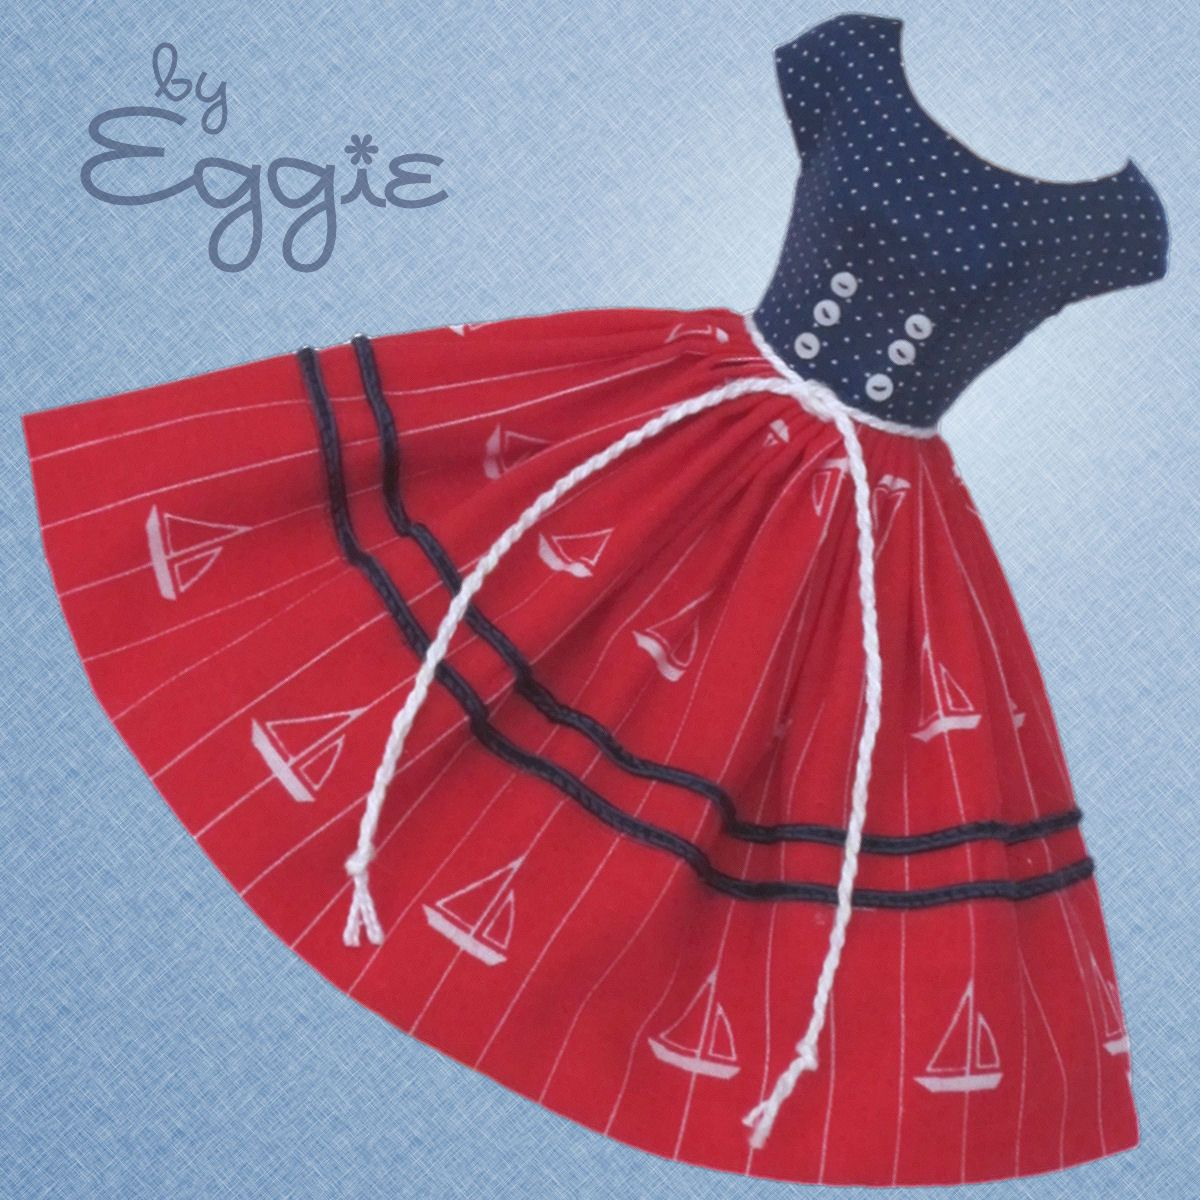 Sail Away Vintage Barbie Doll Dress Reproduction Repro Barbie Clothes Ebay Barbie Clothes Vintage Barbie Dolls Doll Dress